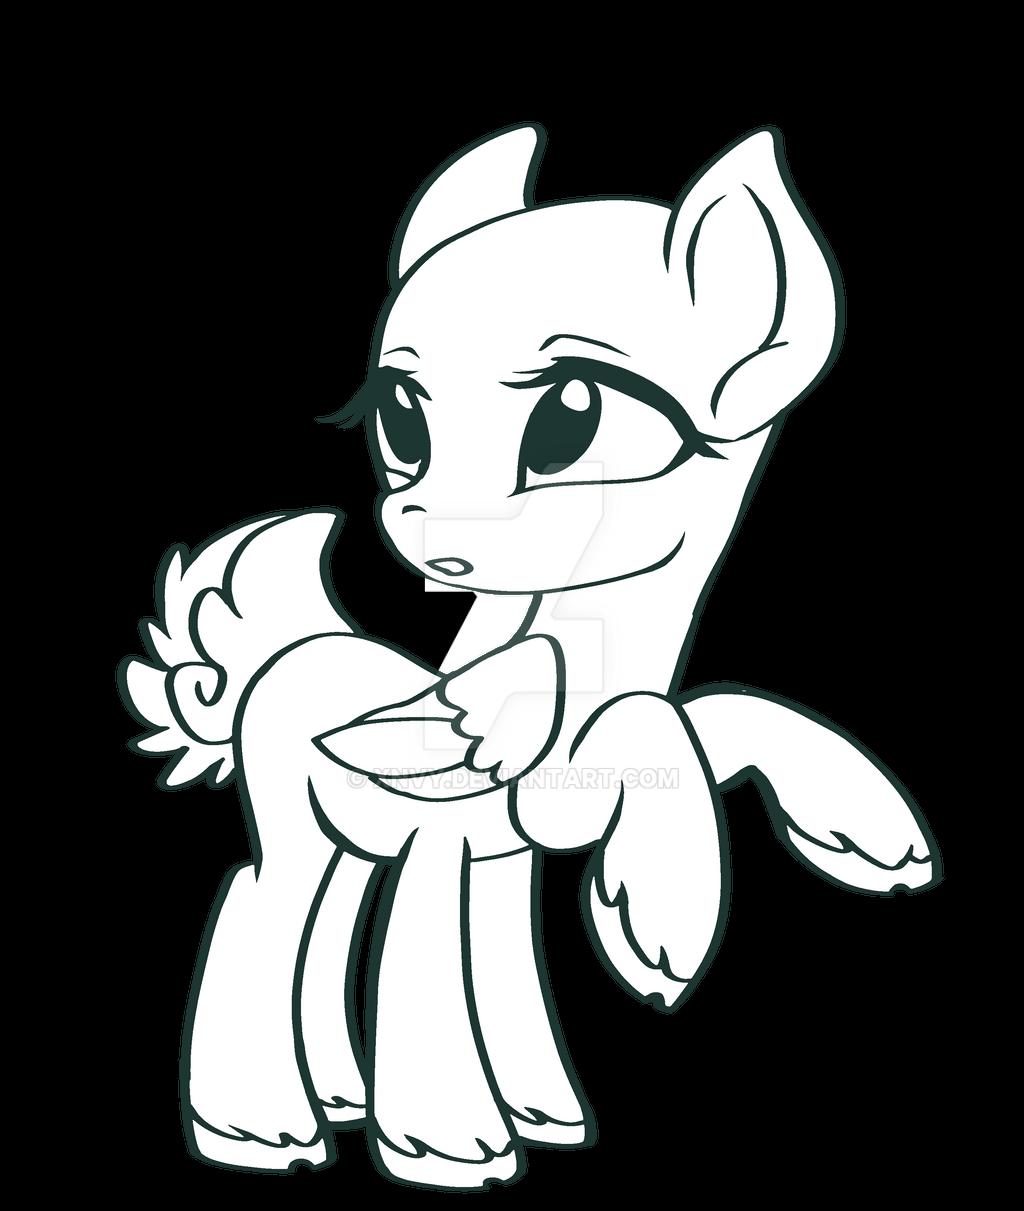 p2u sleipnir deer pony base 20 points by xnvy on deviantart MLP Bat Pony Base p2u sleipnir deer pony base 20 points by xnvy